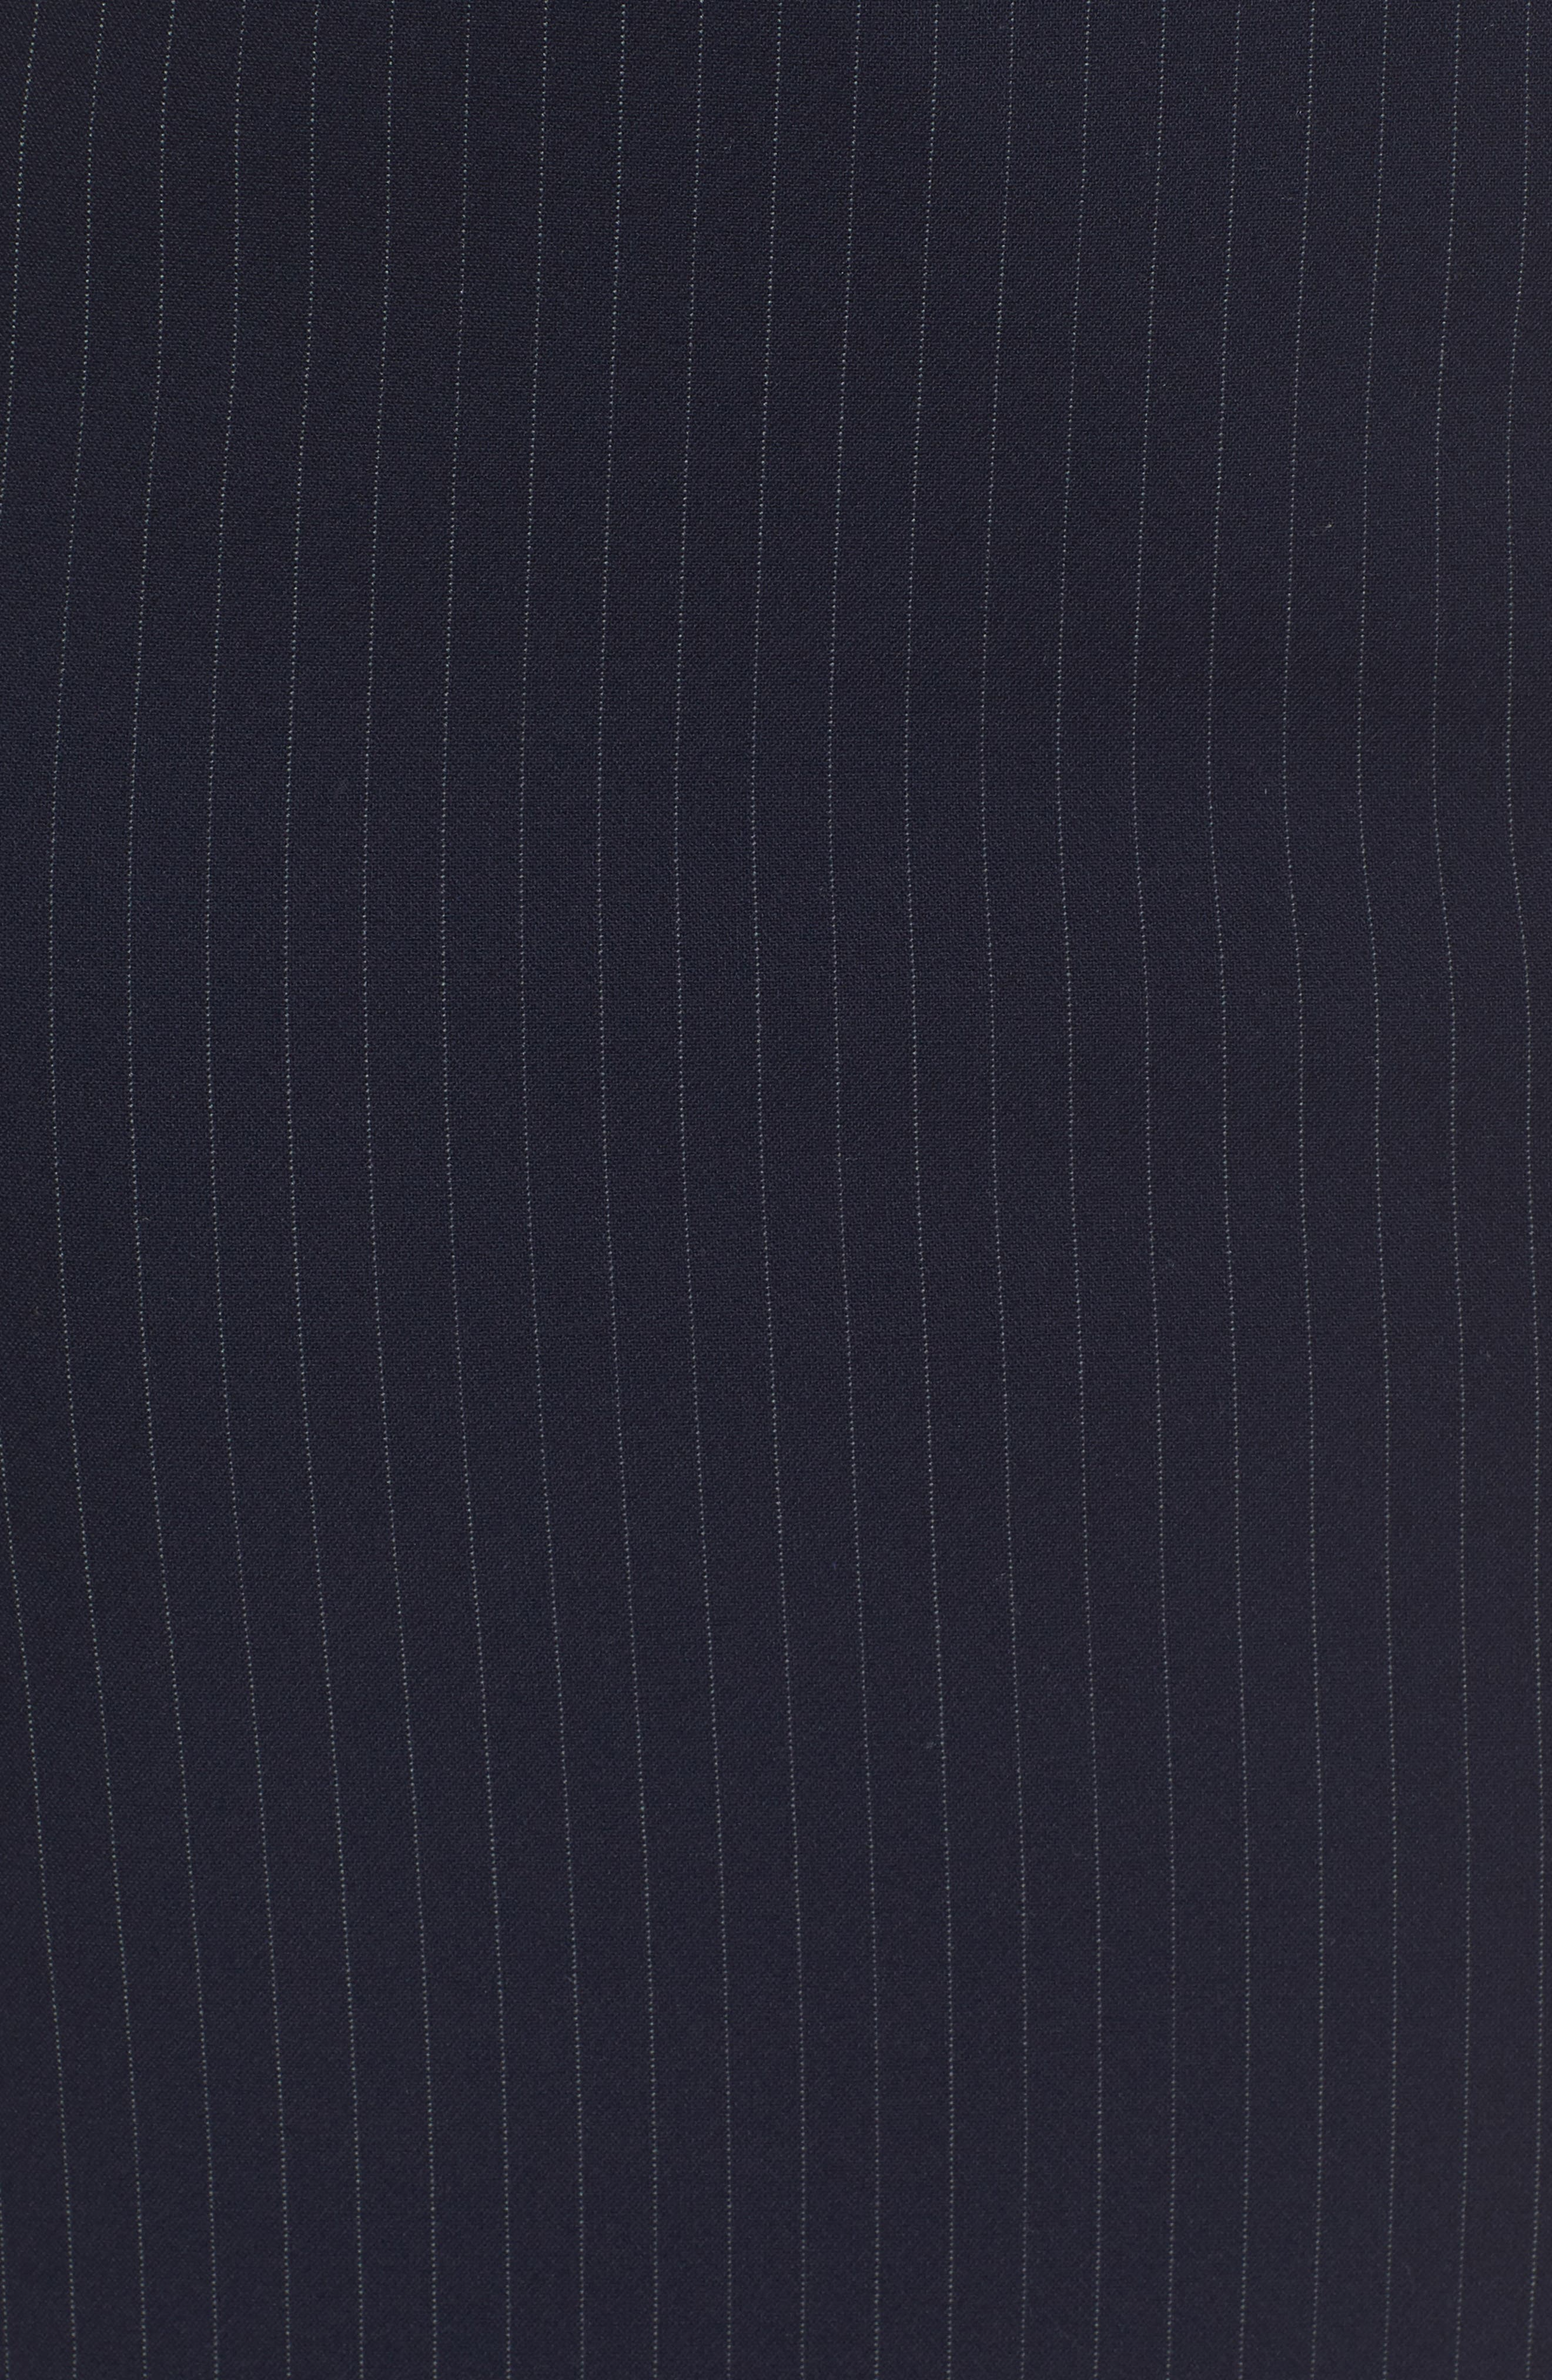 Vispana Pinstripe Suit Skirt,                             Alternate thumbnail 6, color,                             Nautical Fantasy